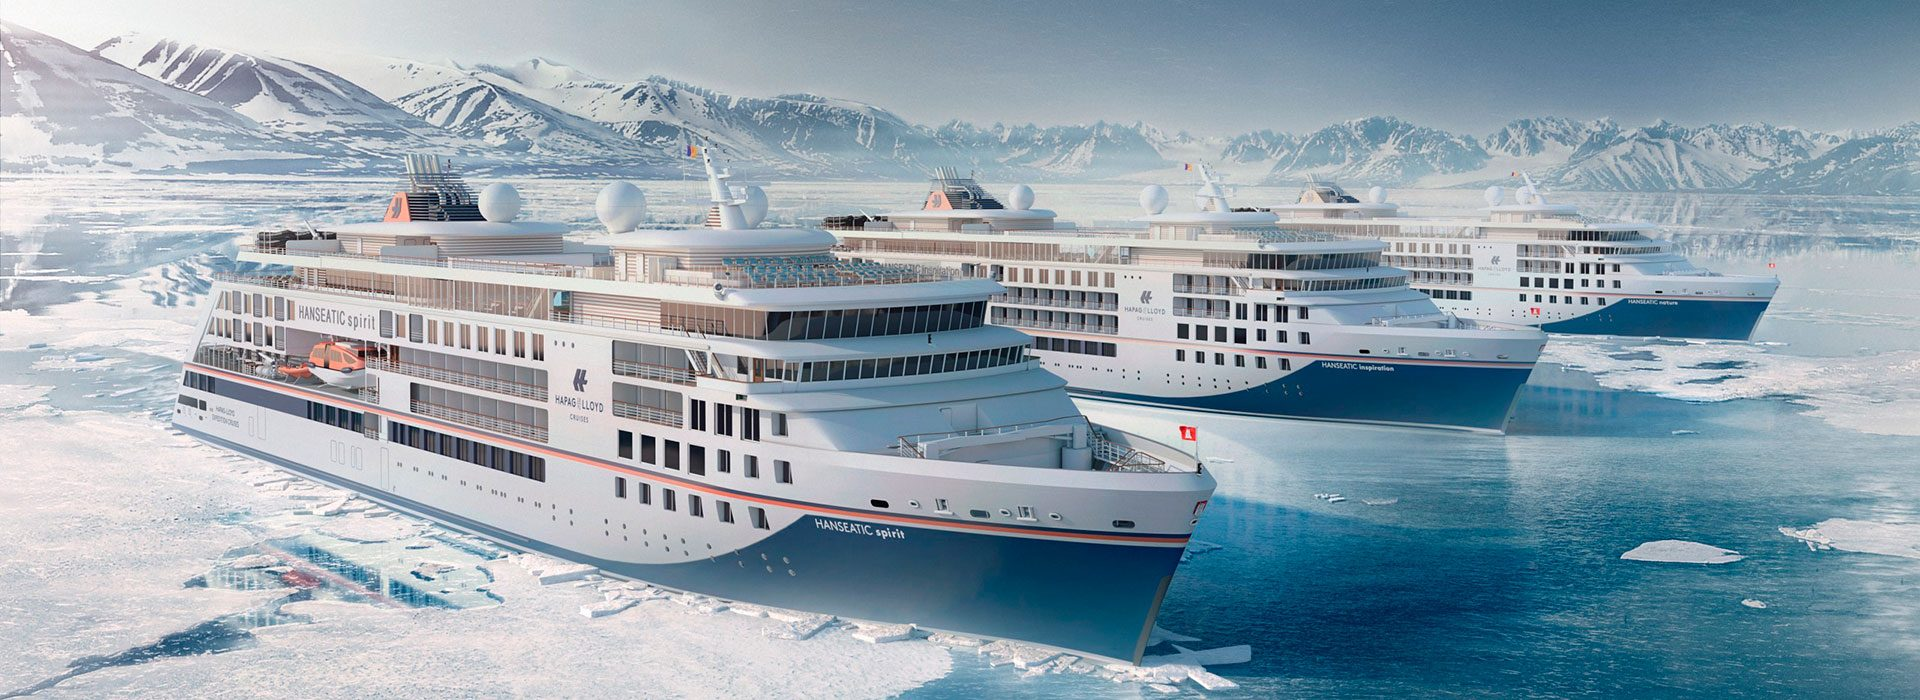 Expeditionsschiffe Hanseatic